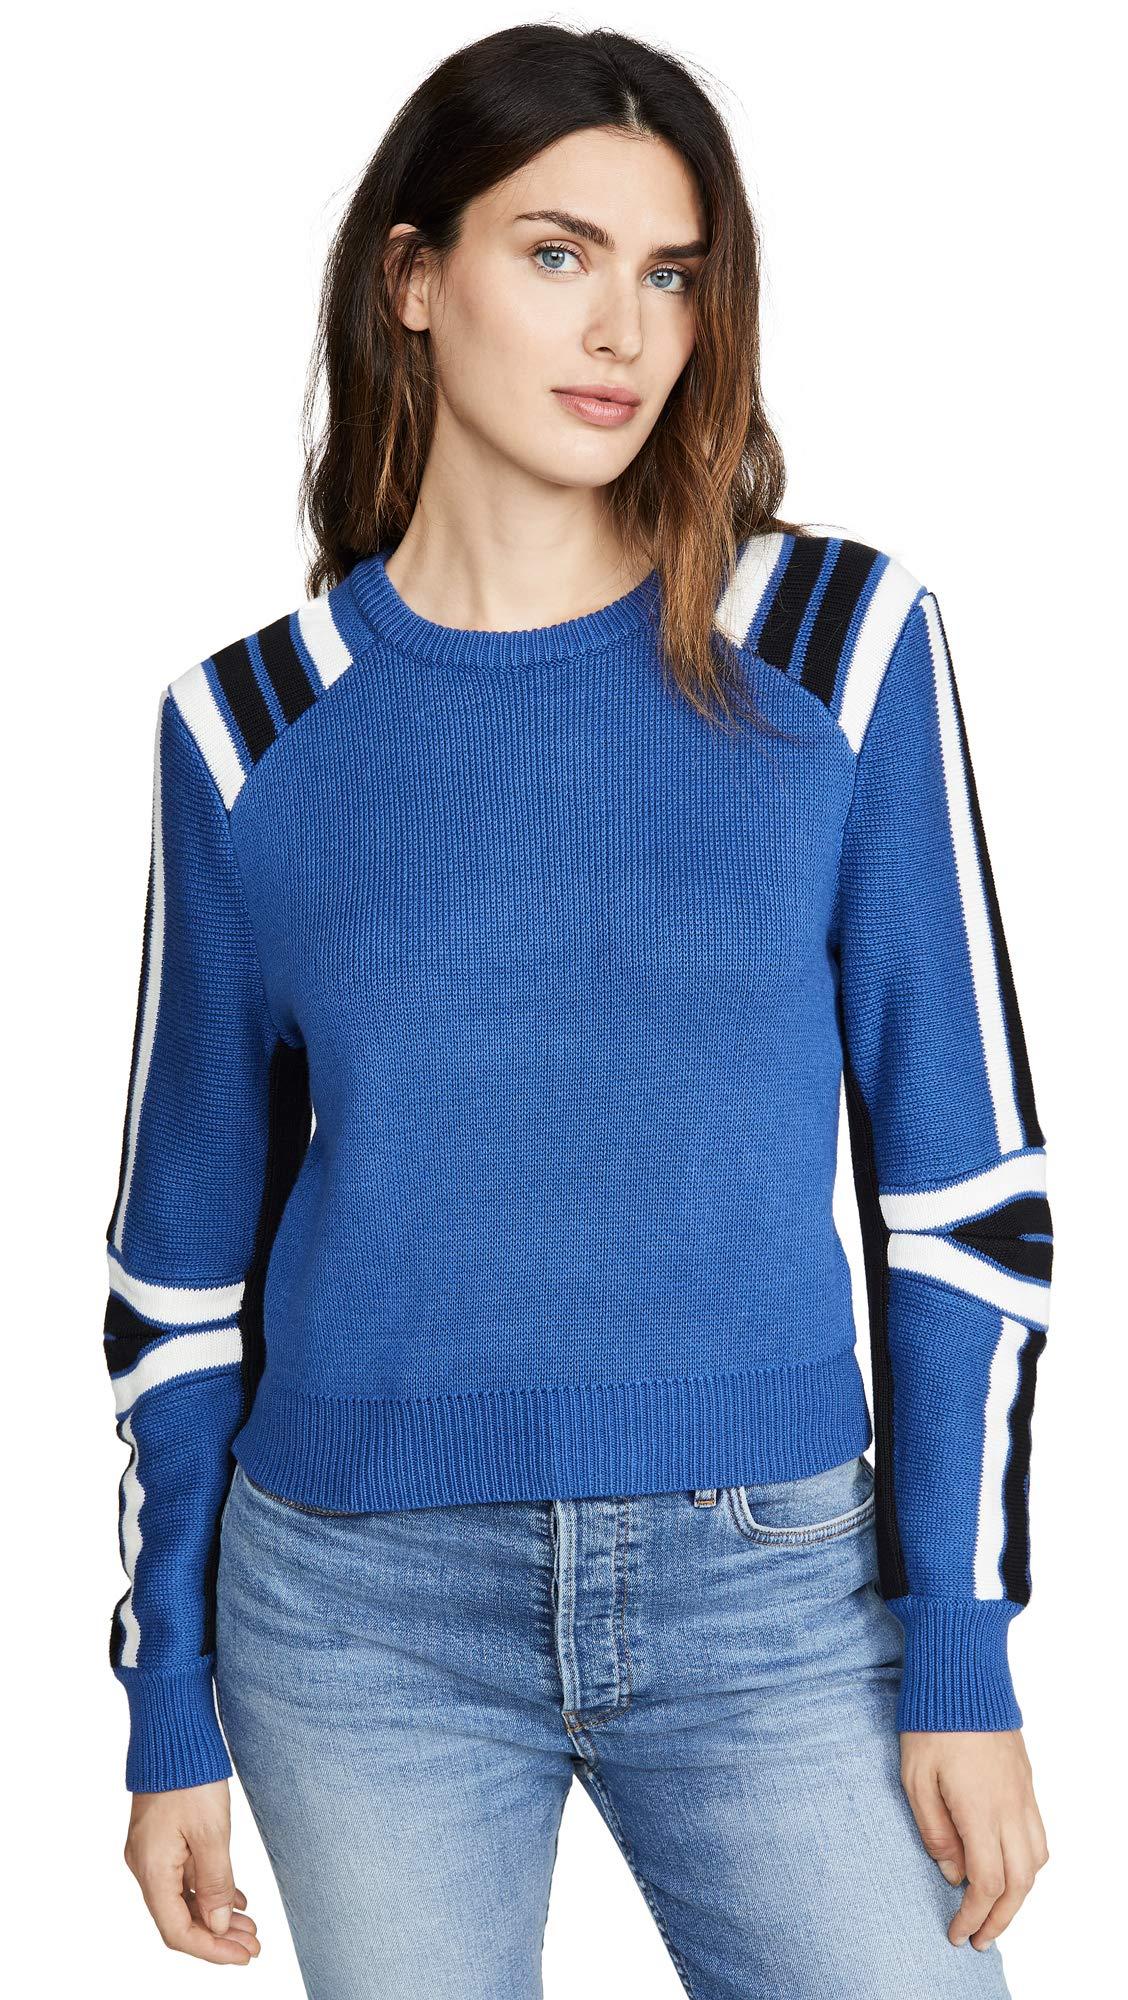 Rebecca Minkoff Women's Janica Sweater